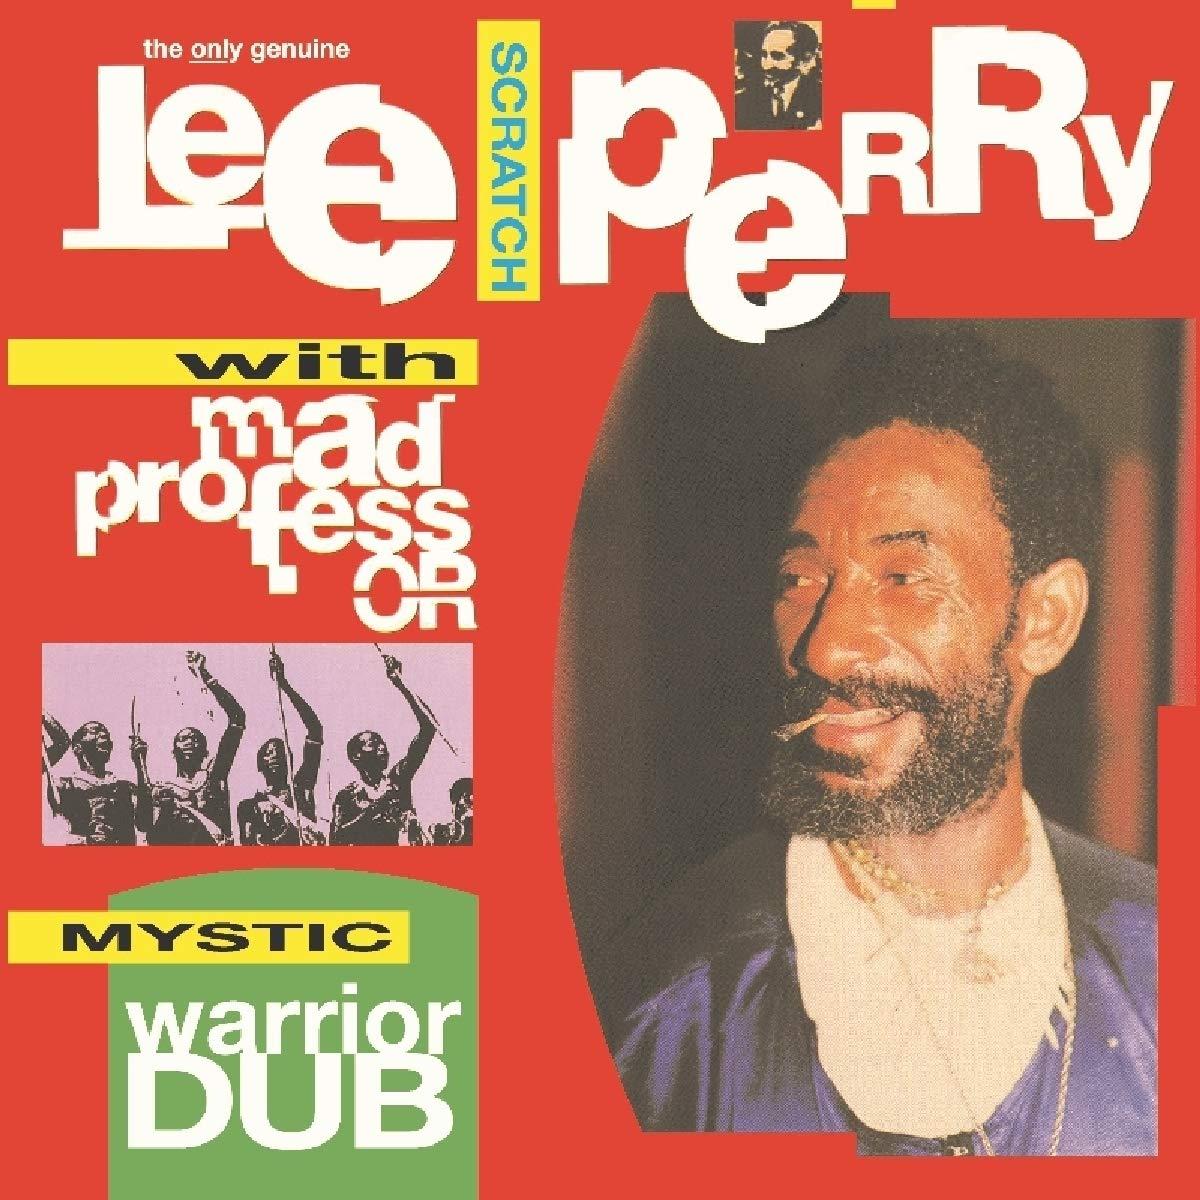 Vinilo : Lee Perry Scratch - Mystic Warrior Dub (LP Vinyl)